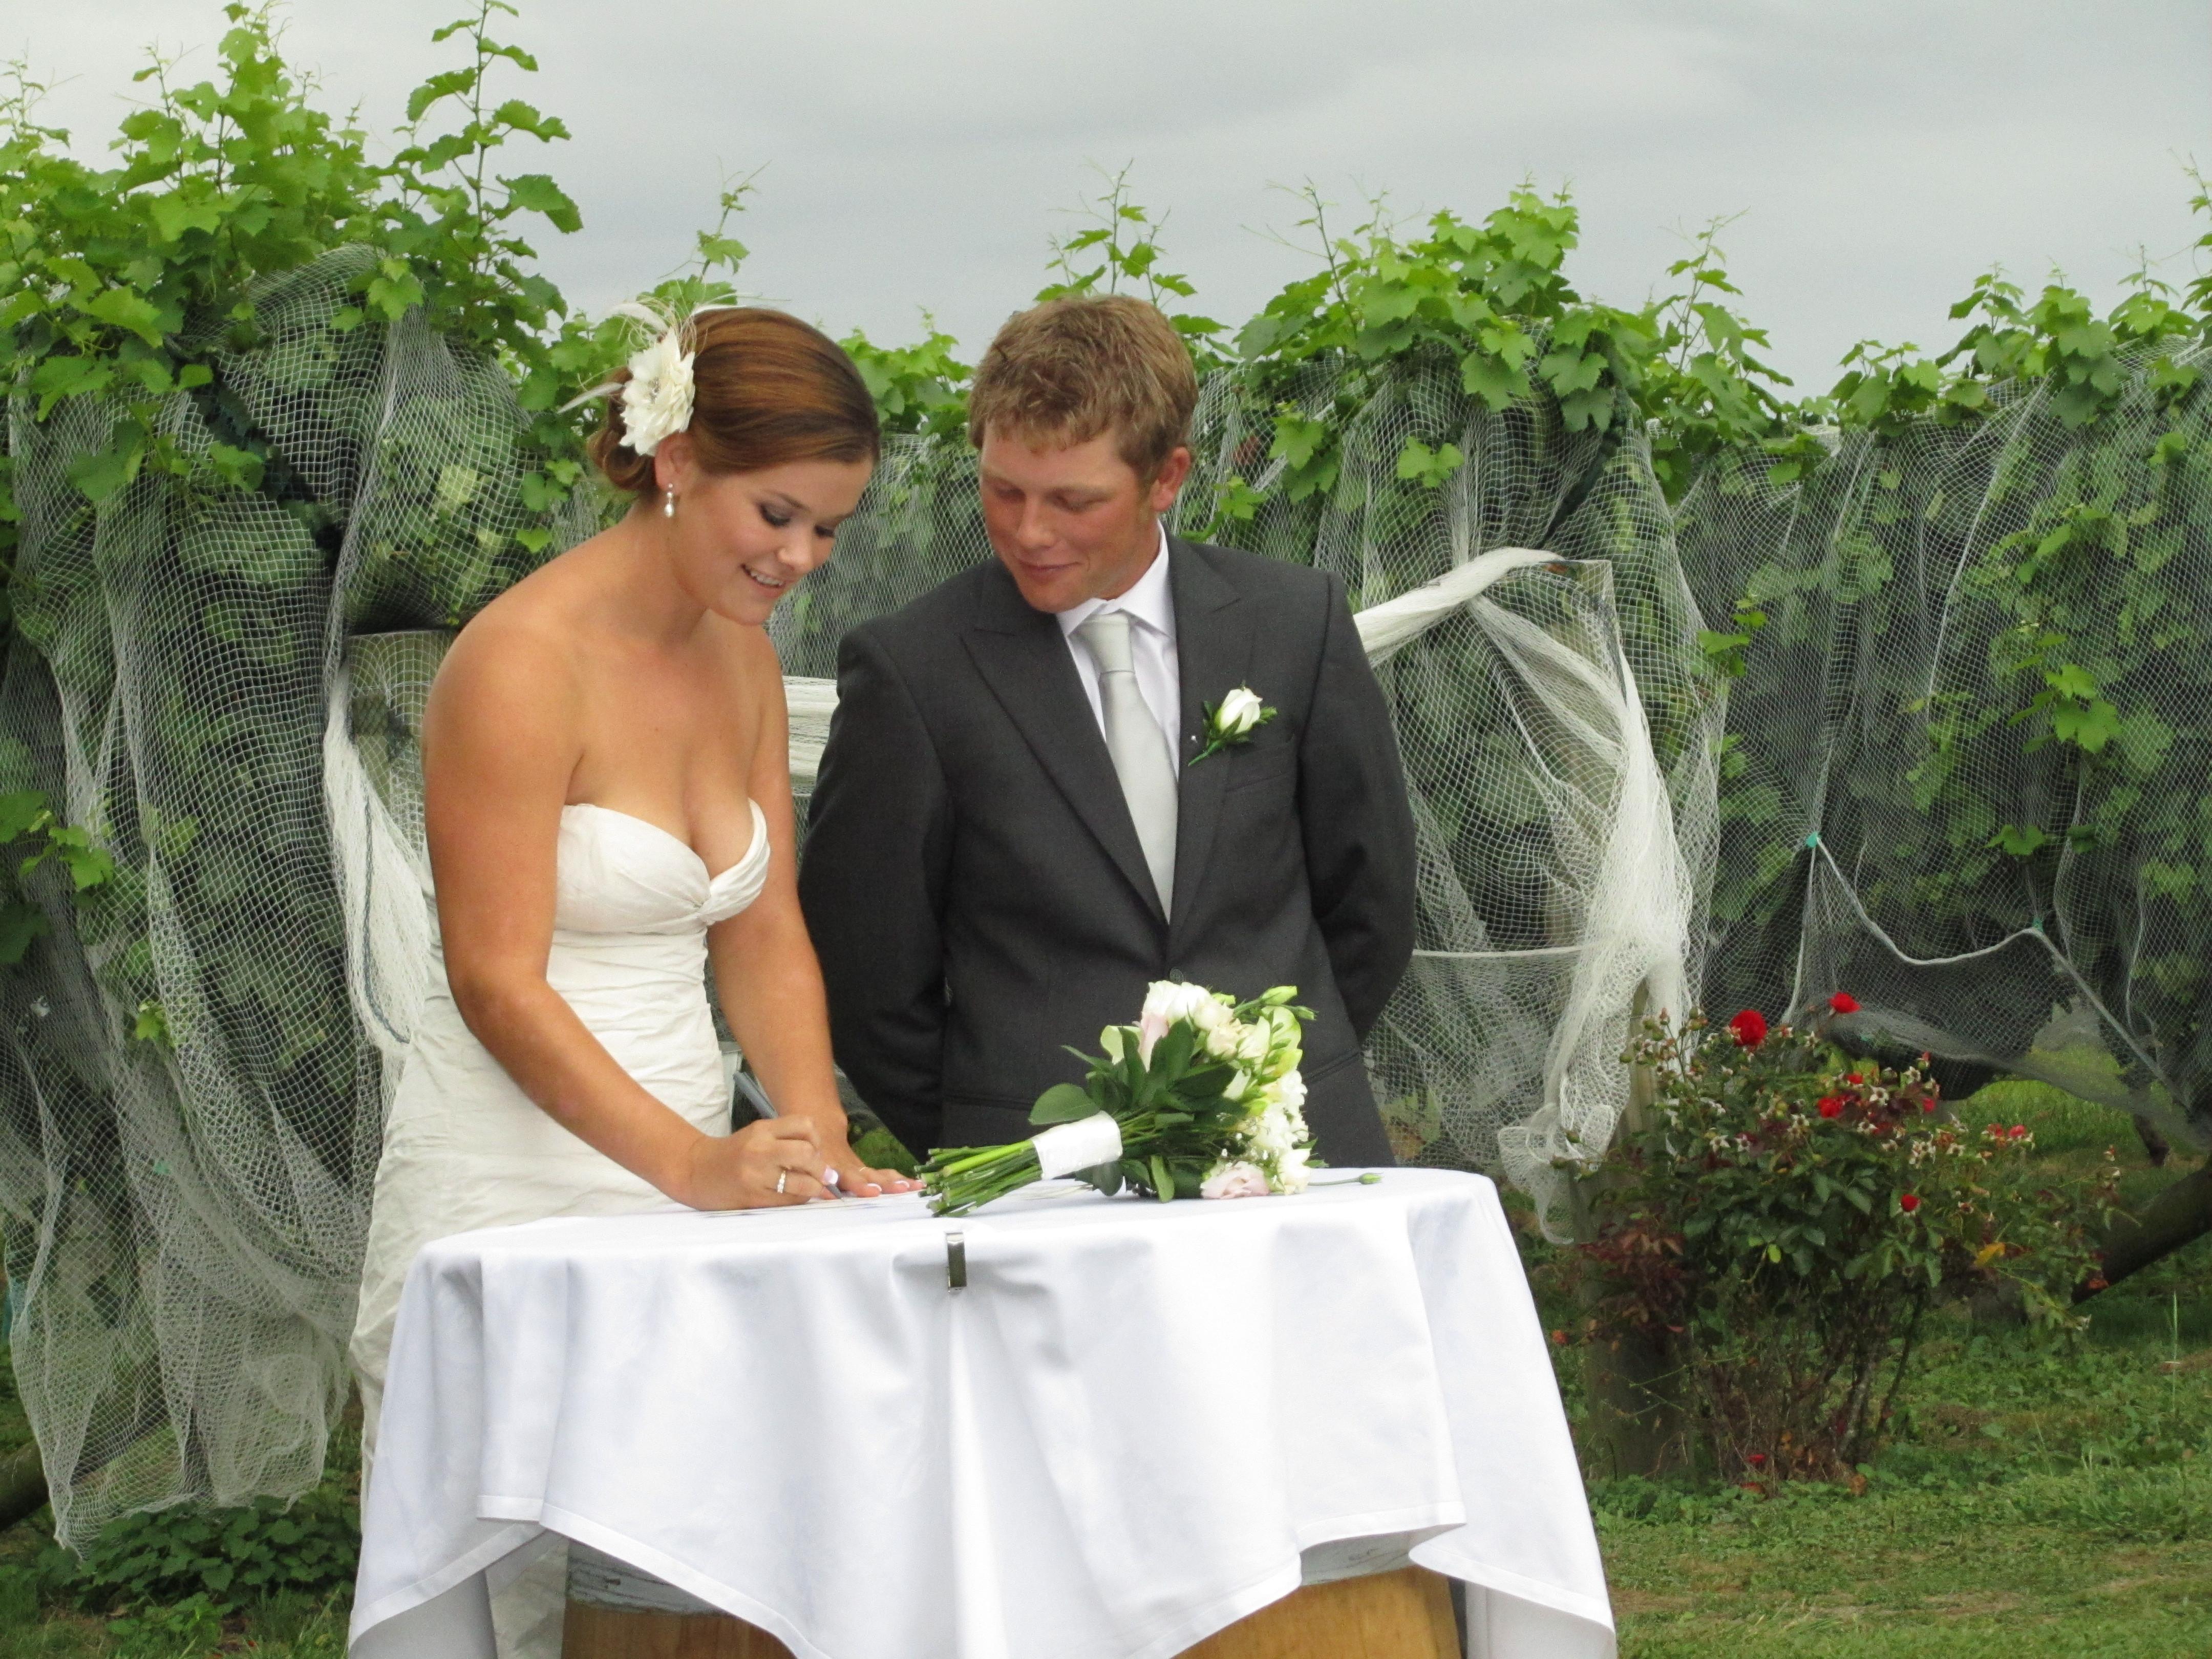 Wedding at Waiwurrie